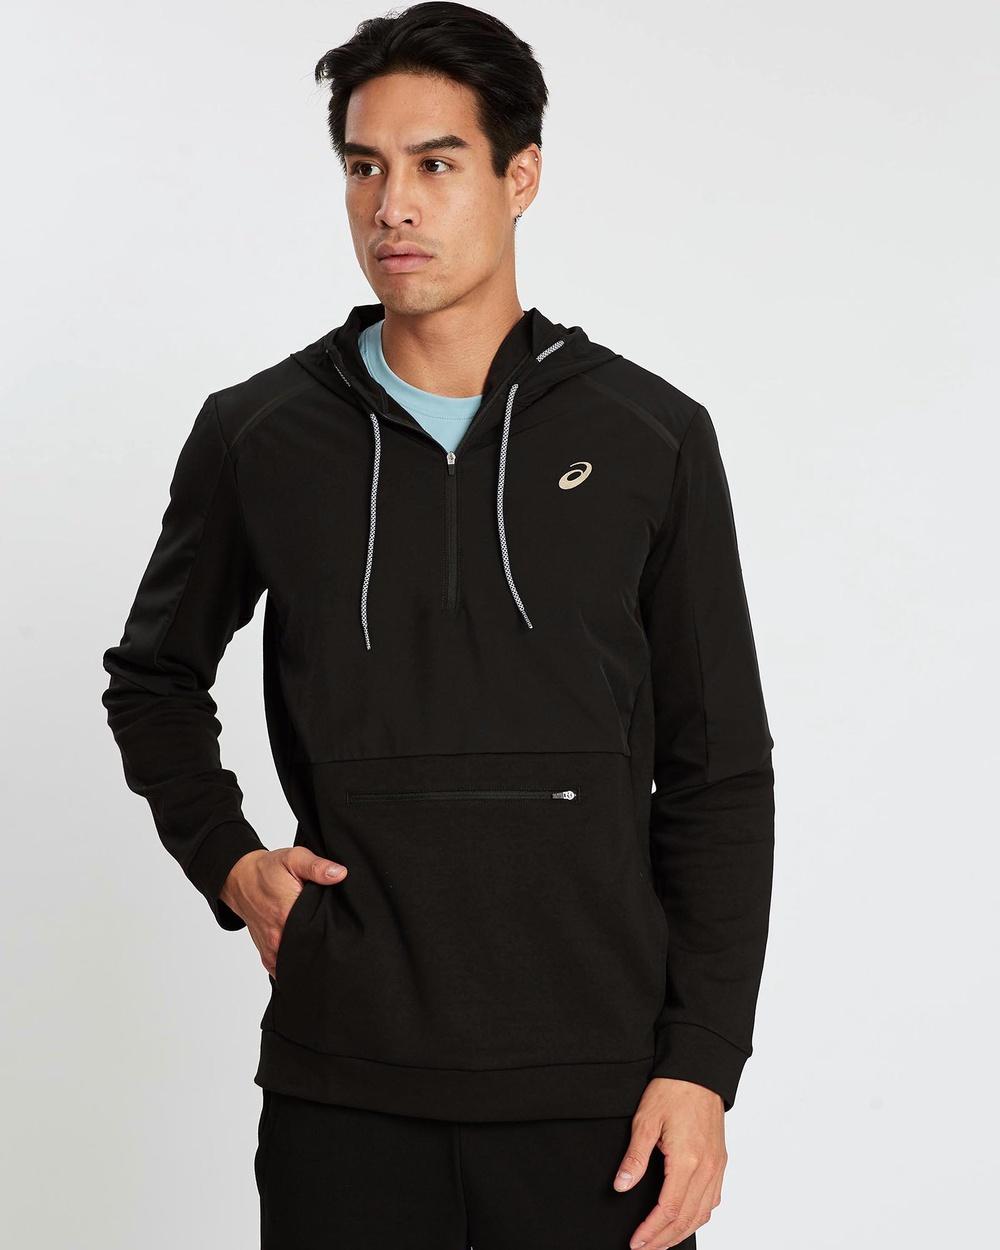 ASICS Tokyo Sportswear Anorak Men's – Coats & Jackets (Performance Black/ Performance Black) AU$160 | Clothing Factories Australia